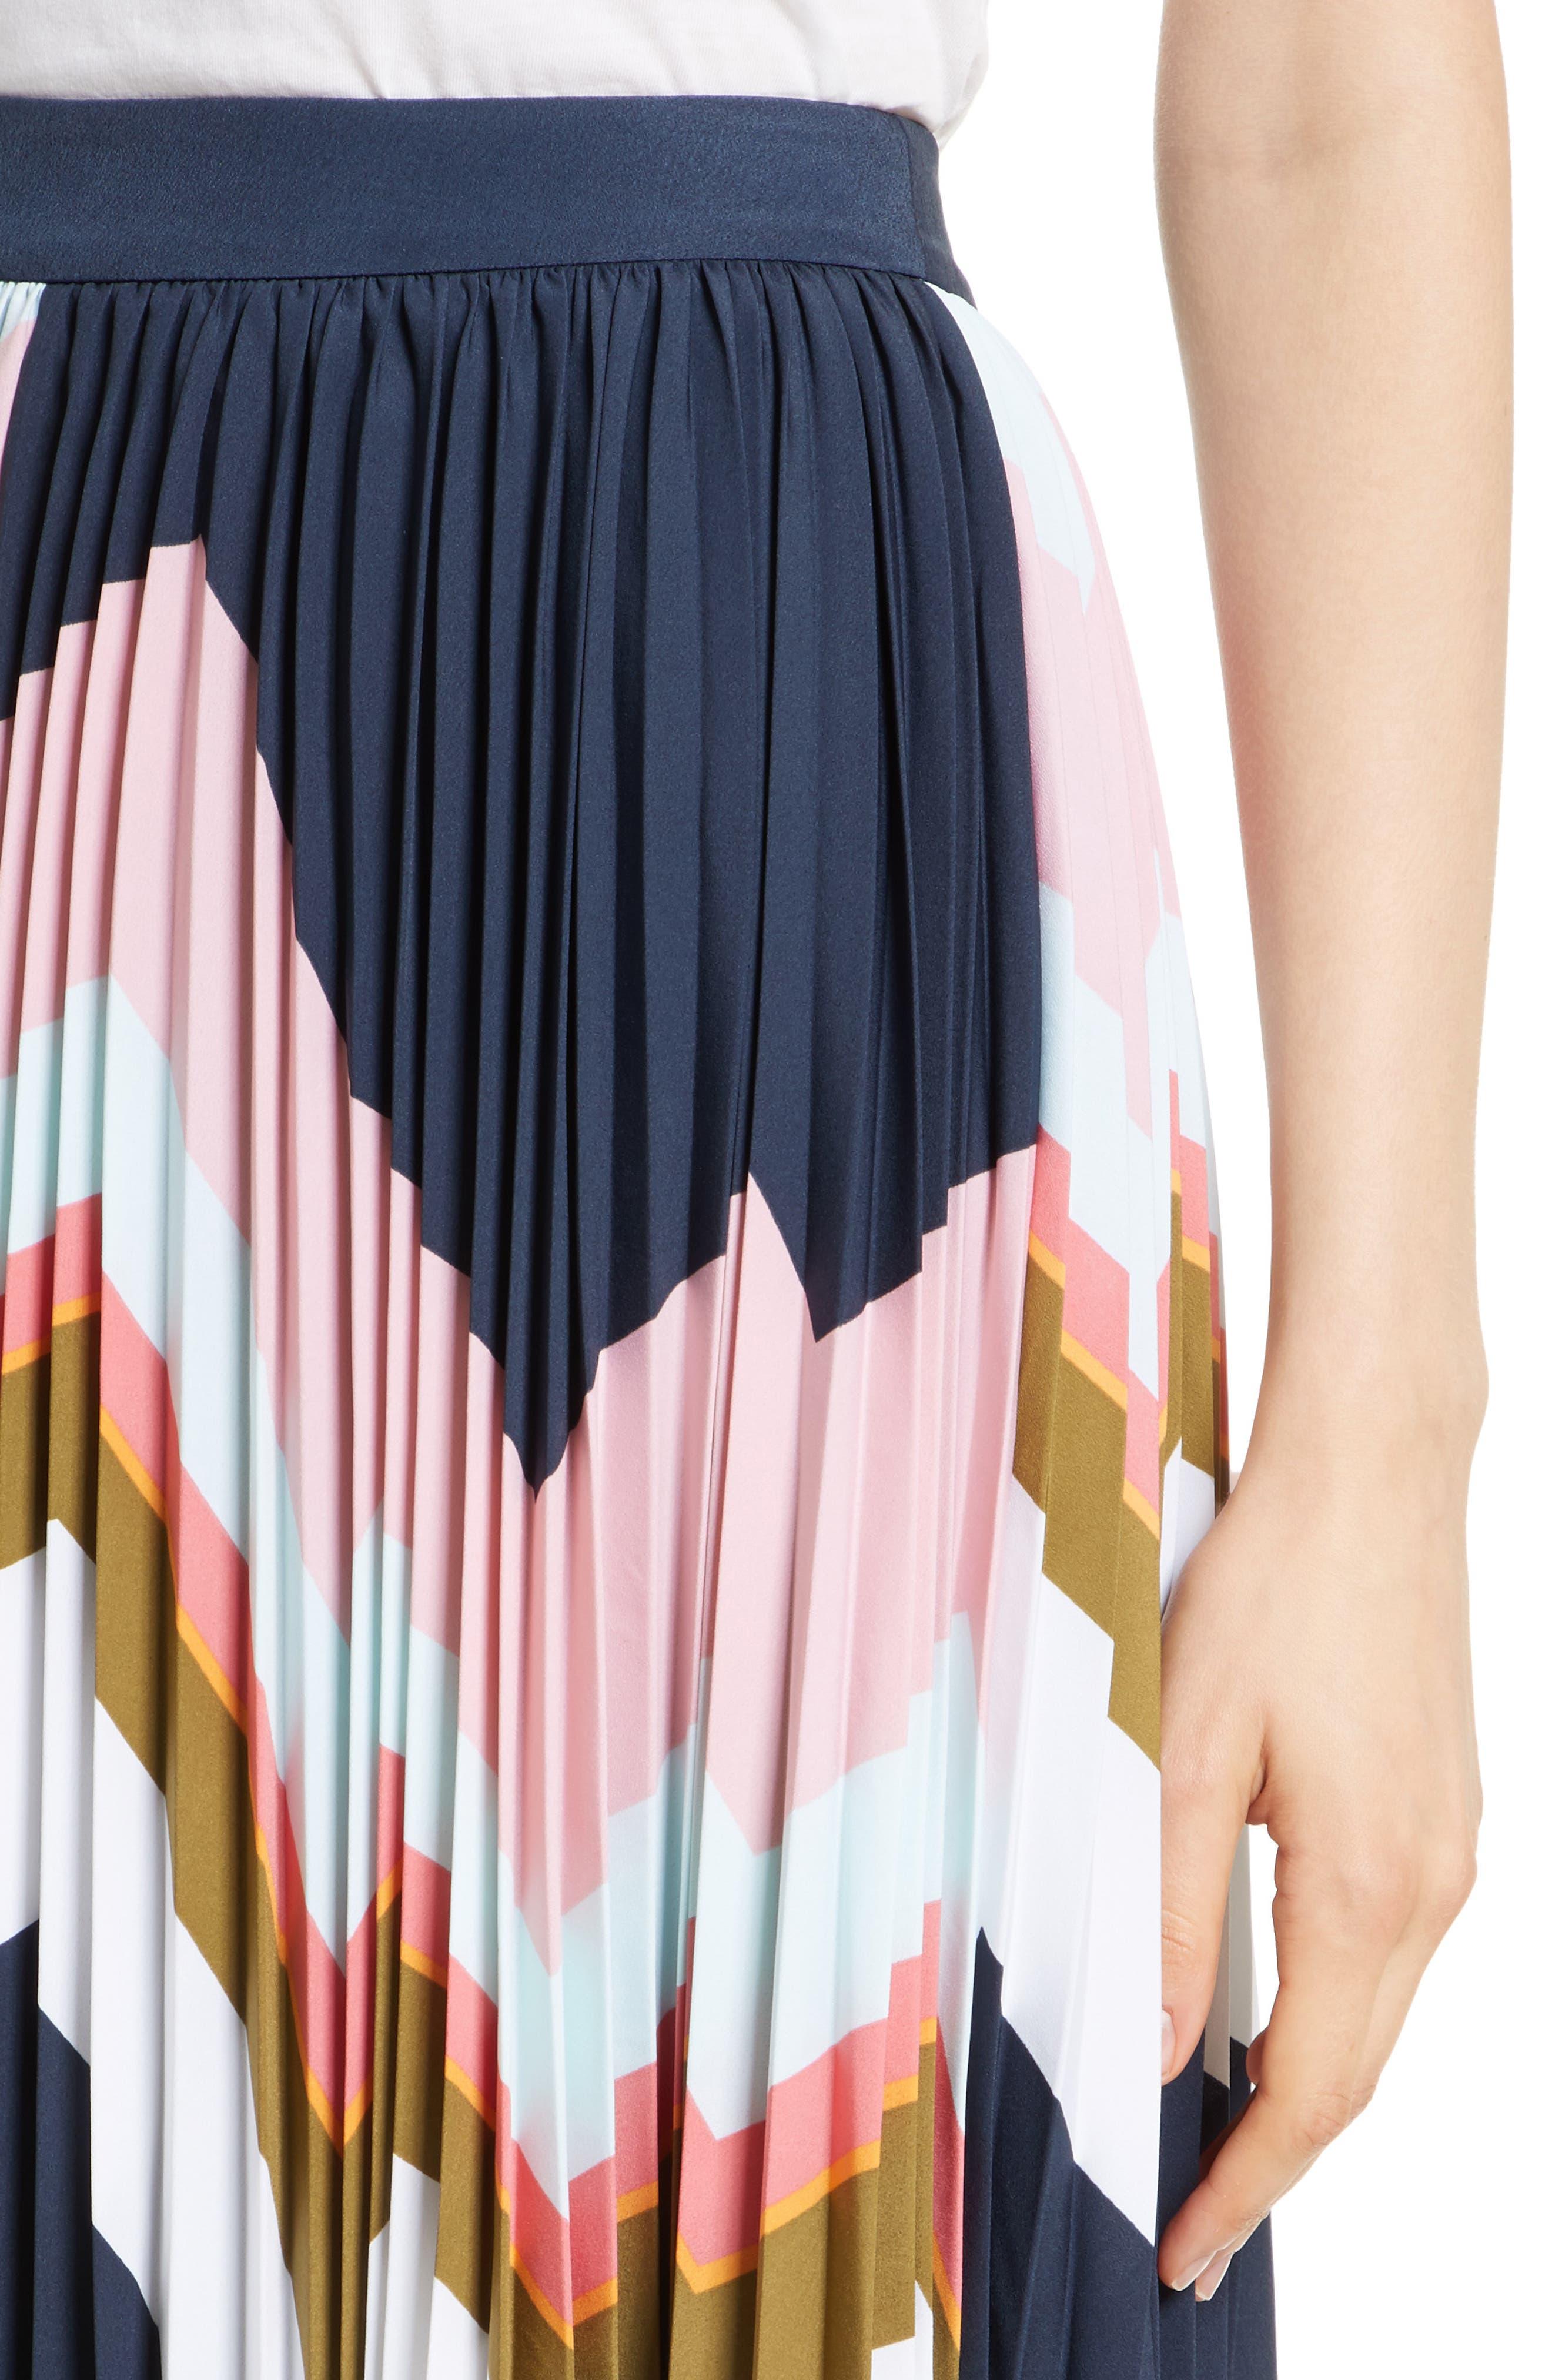 Evianna Mississippi Print Pleated Skirt,                             Alternate thumbnail 4, color,                             410